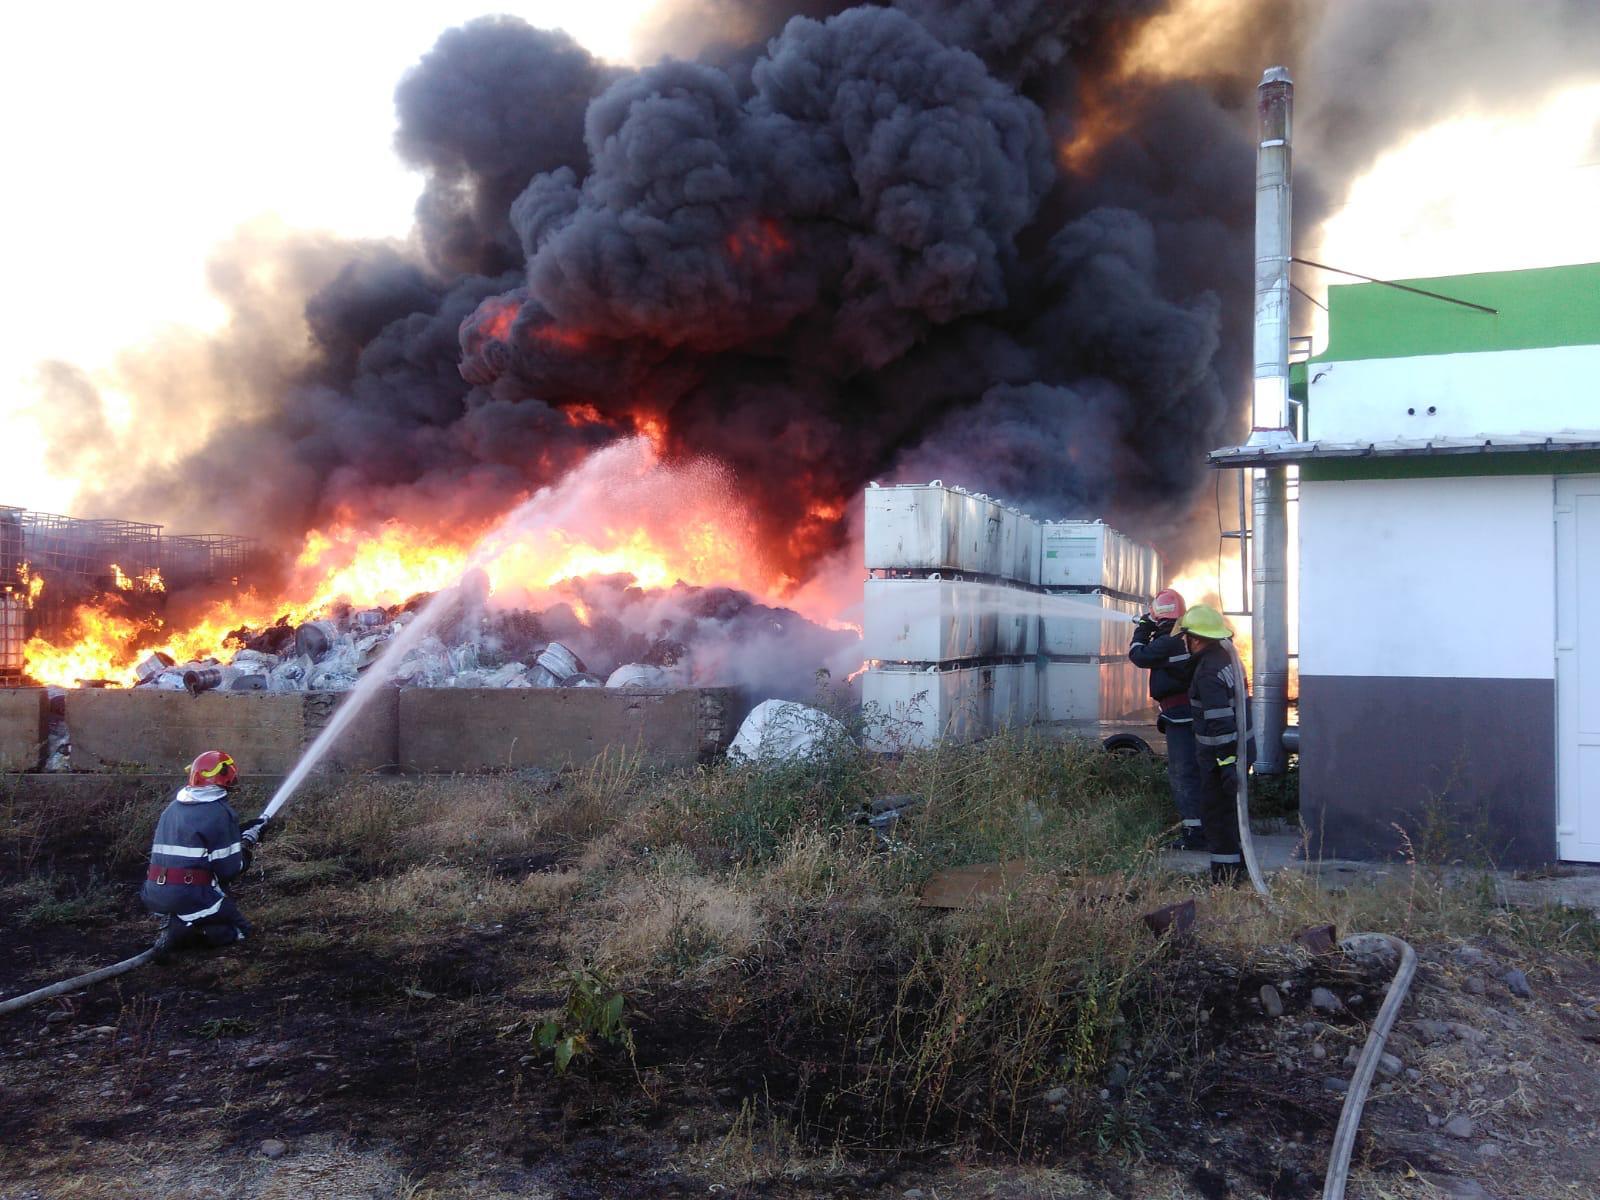 Incendiu puternic la un punct de colectare mase plastice